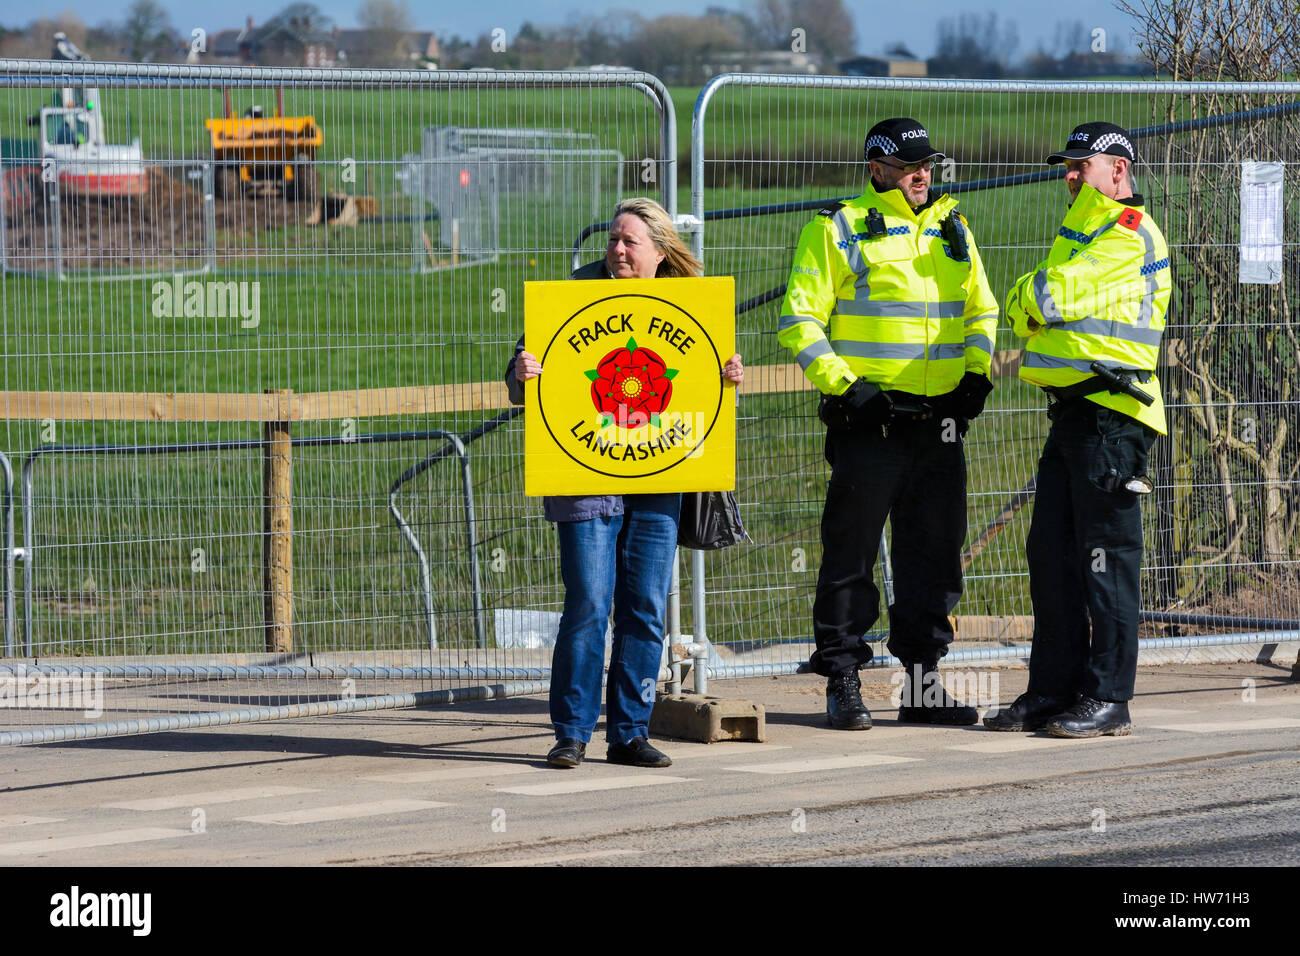 Anti-fracking protester. - Stock Image